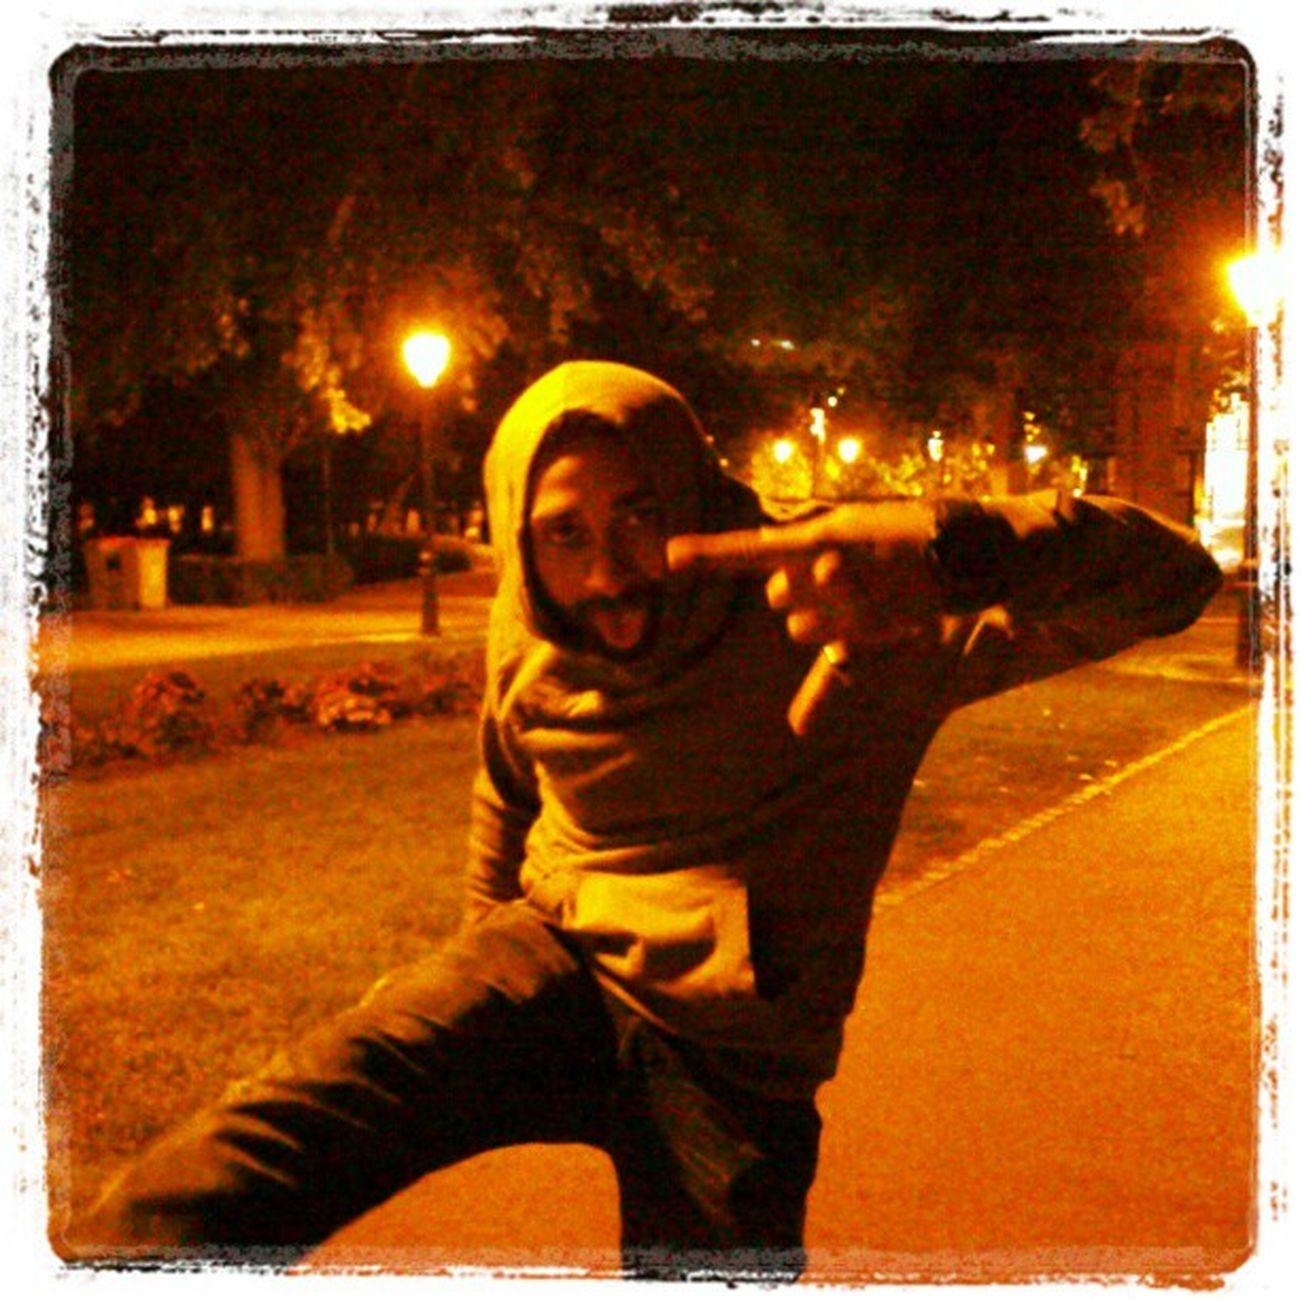 My Friend Goofing Around at ElRetiro el retiro park madrid spain